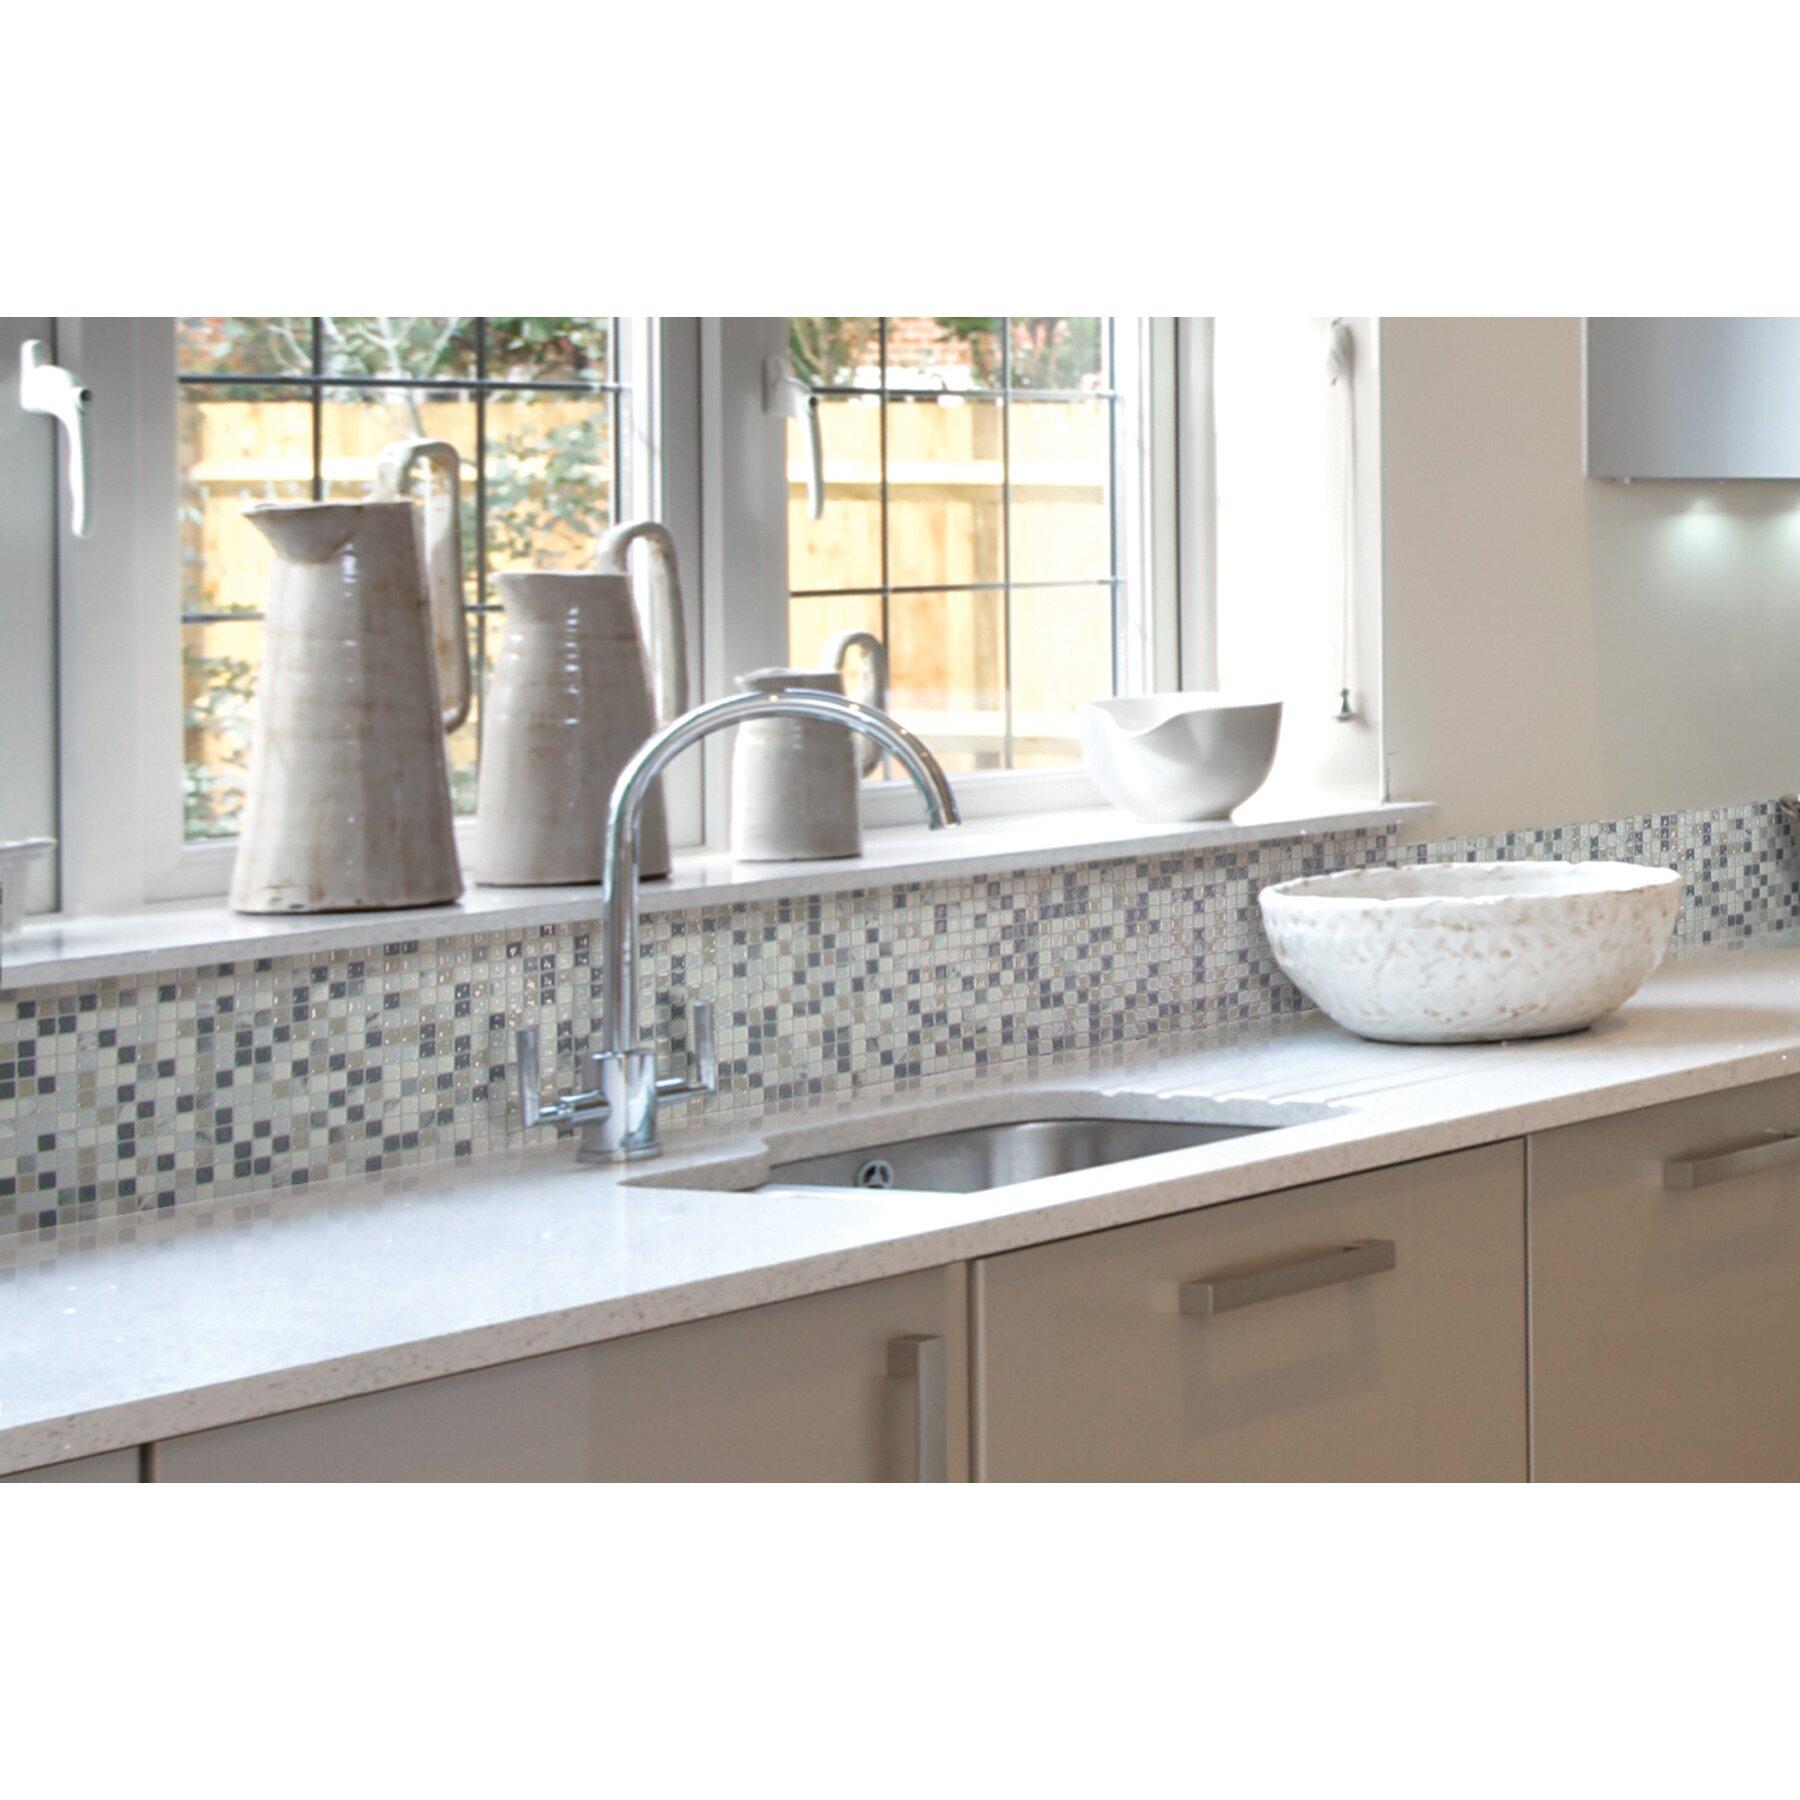 Smart tiles mosaik minimo noche x peel for Mosaic bathroom bin